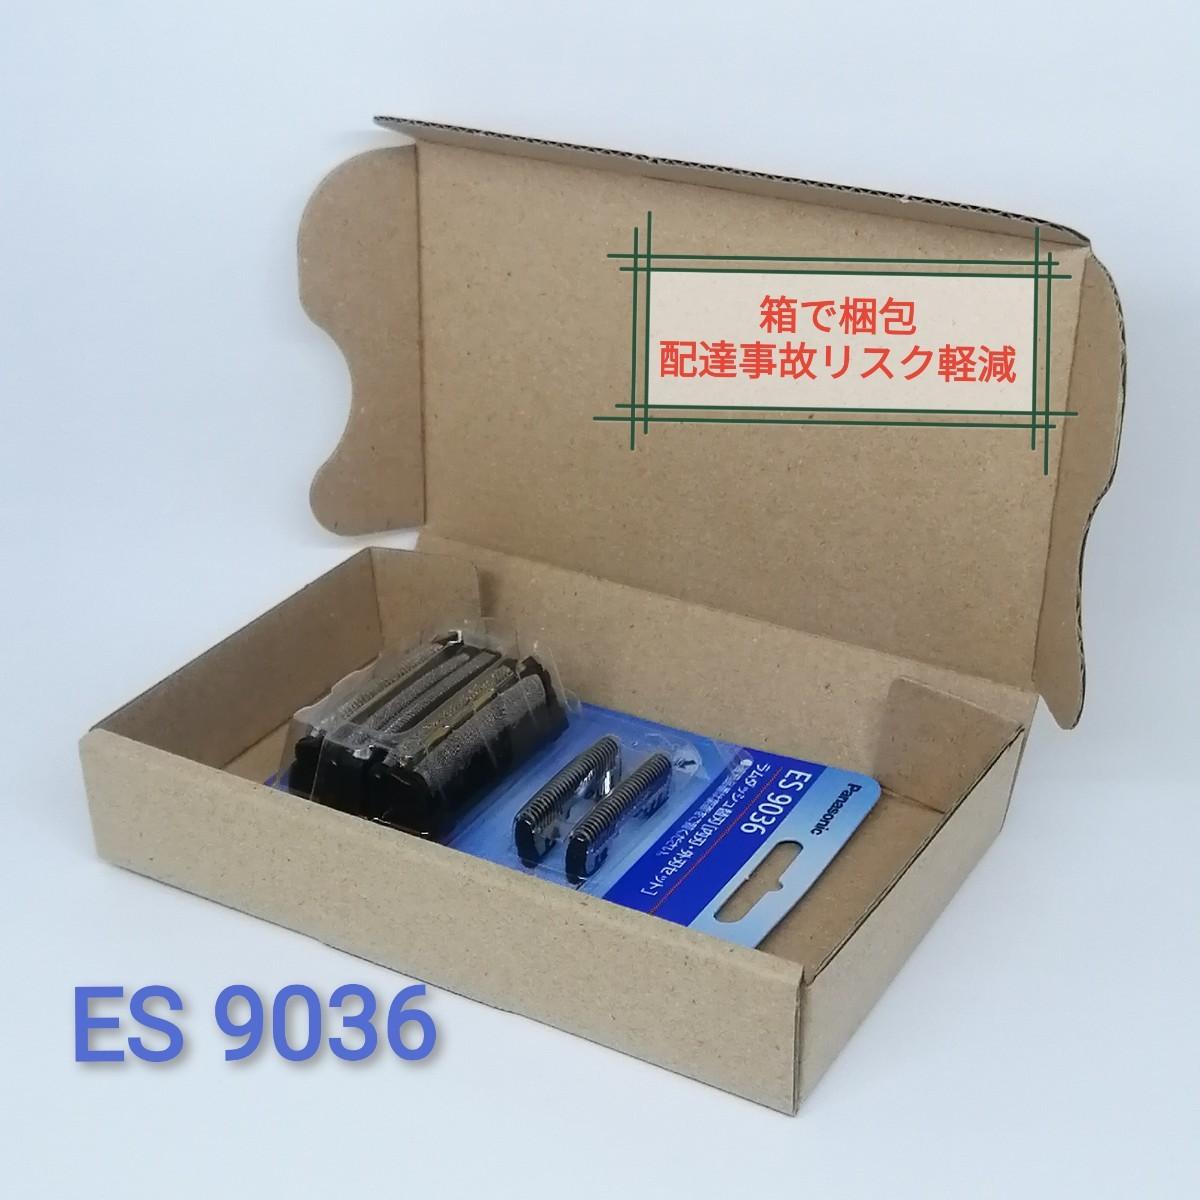 ES9036 シェーバー 替刃 パナソニック正規品★安心!箱で梱包★Panasonic